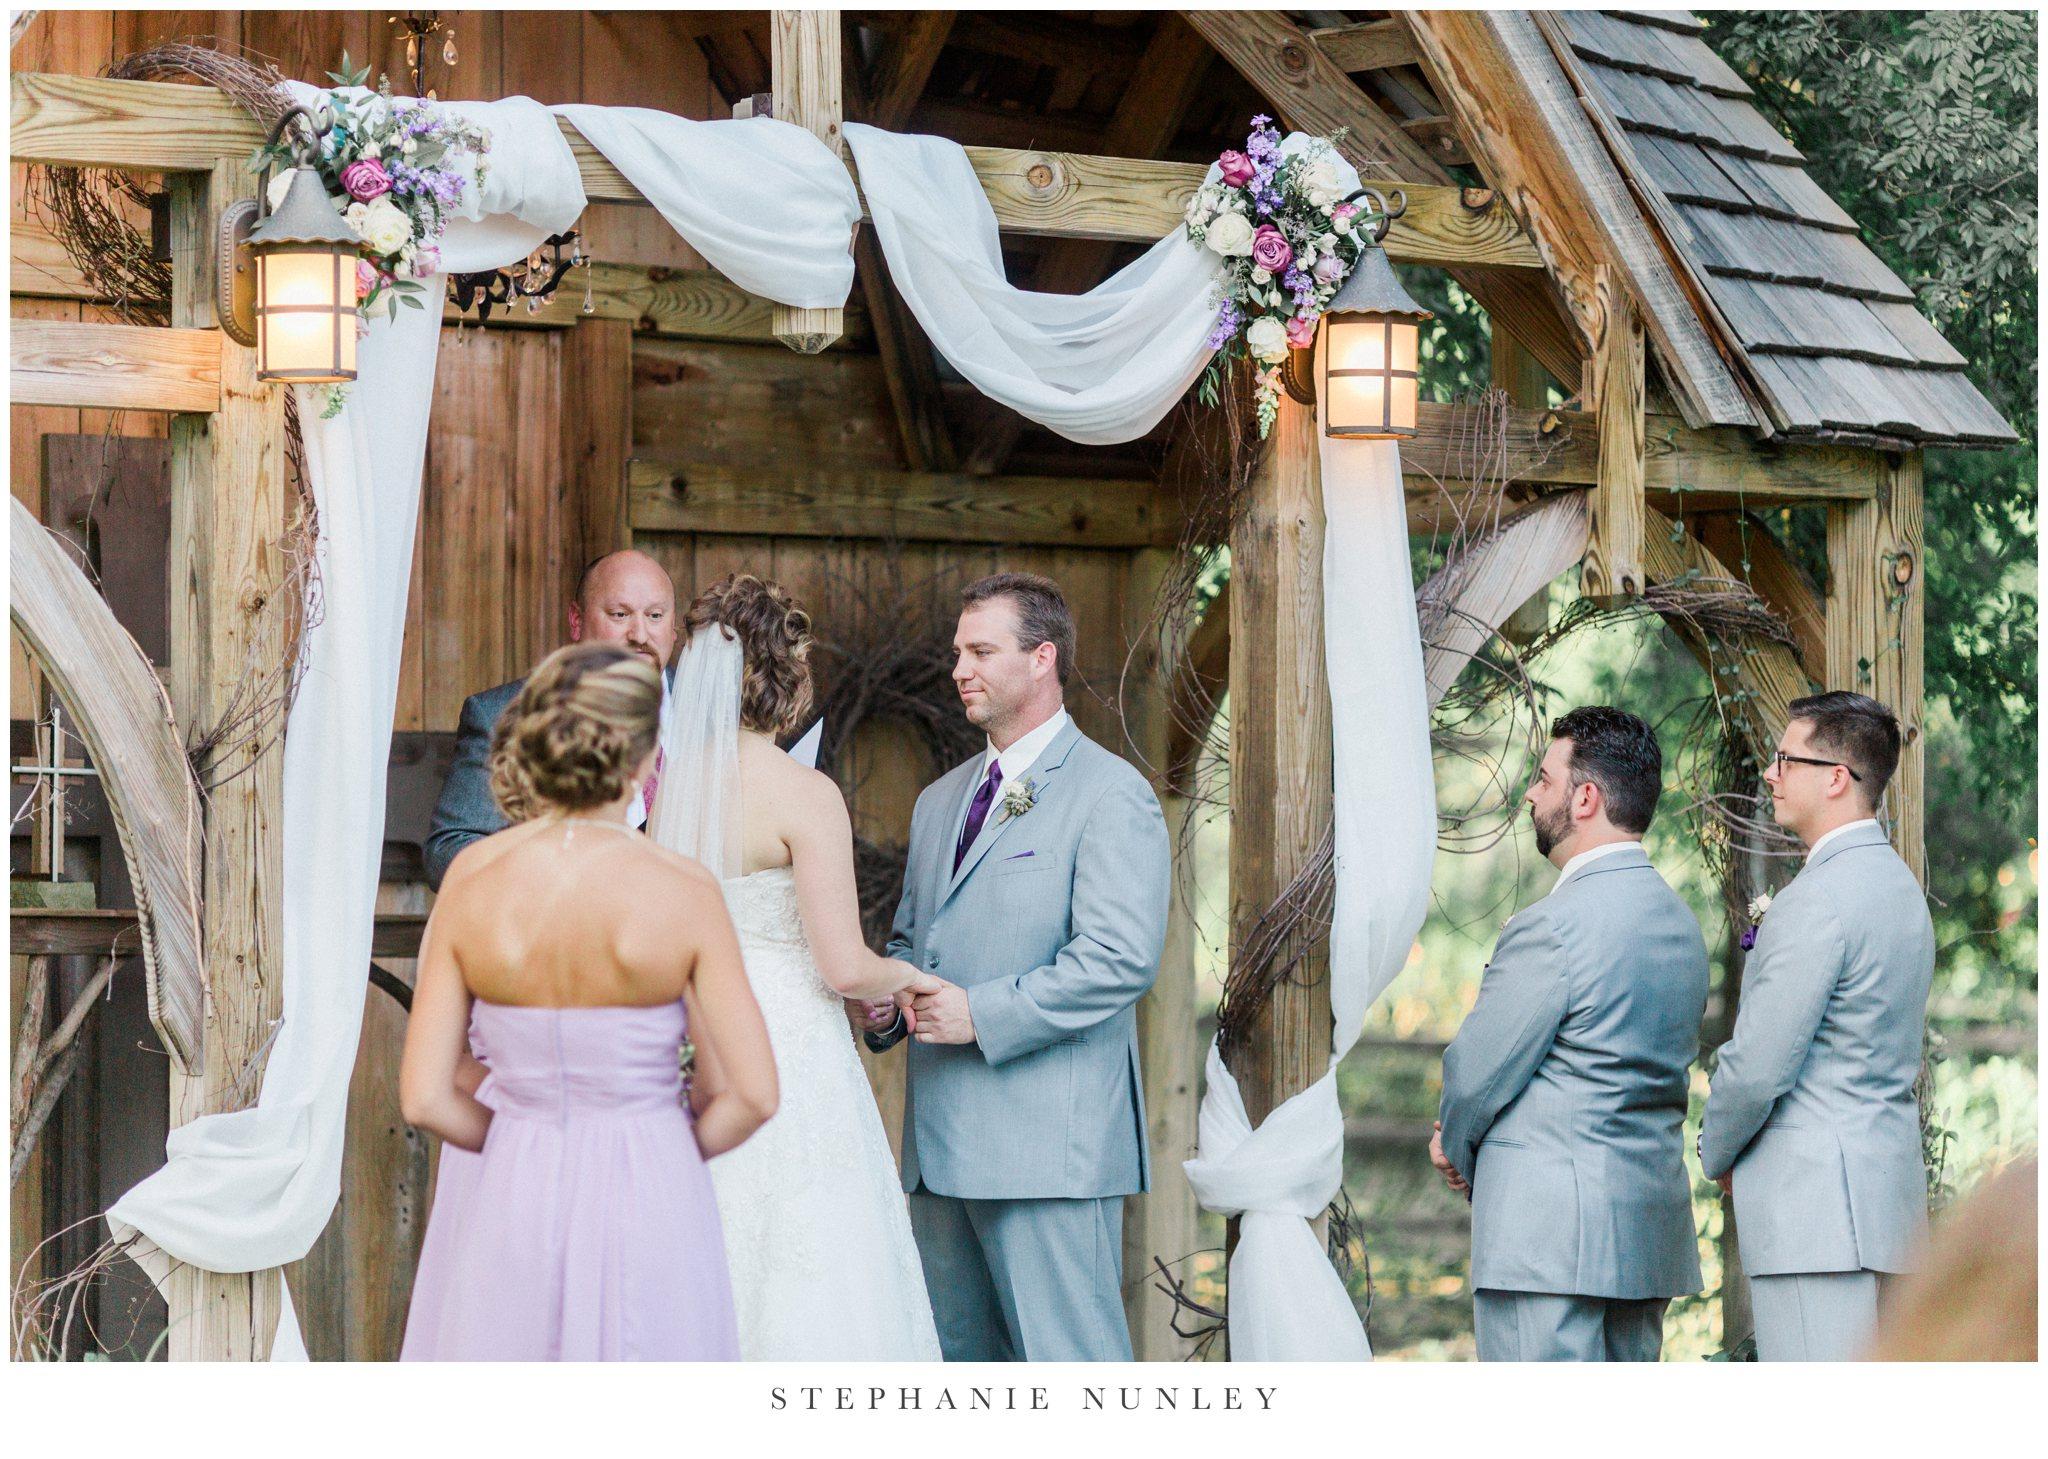 southern-classy-outdoor-barn-wedding-photos-0083.jpg